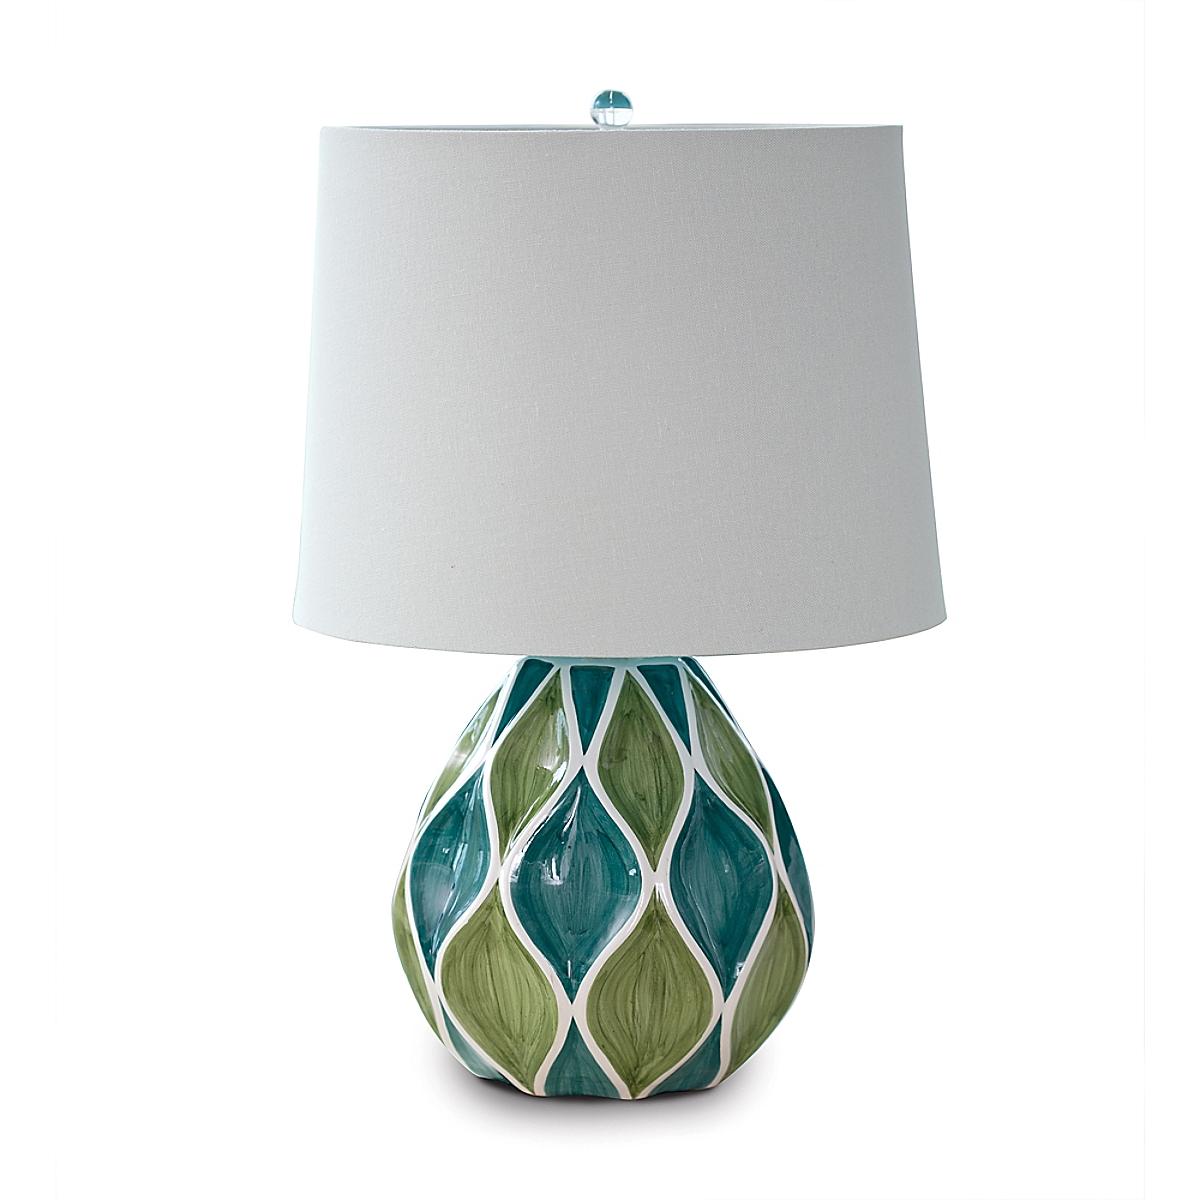 Greatest Table Lamp - Task Lamp - Maine Cottage® DG29